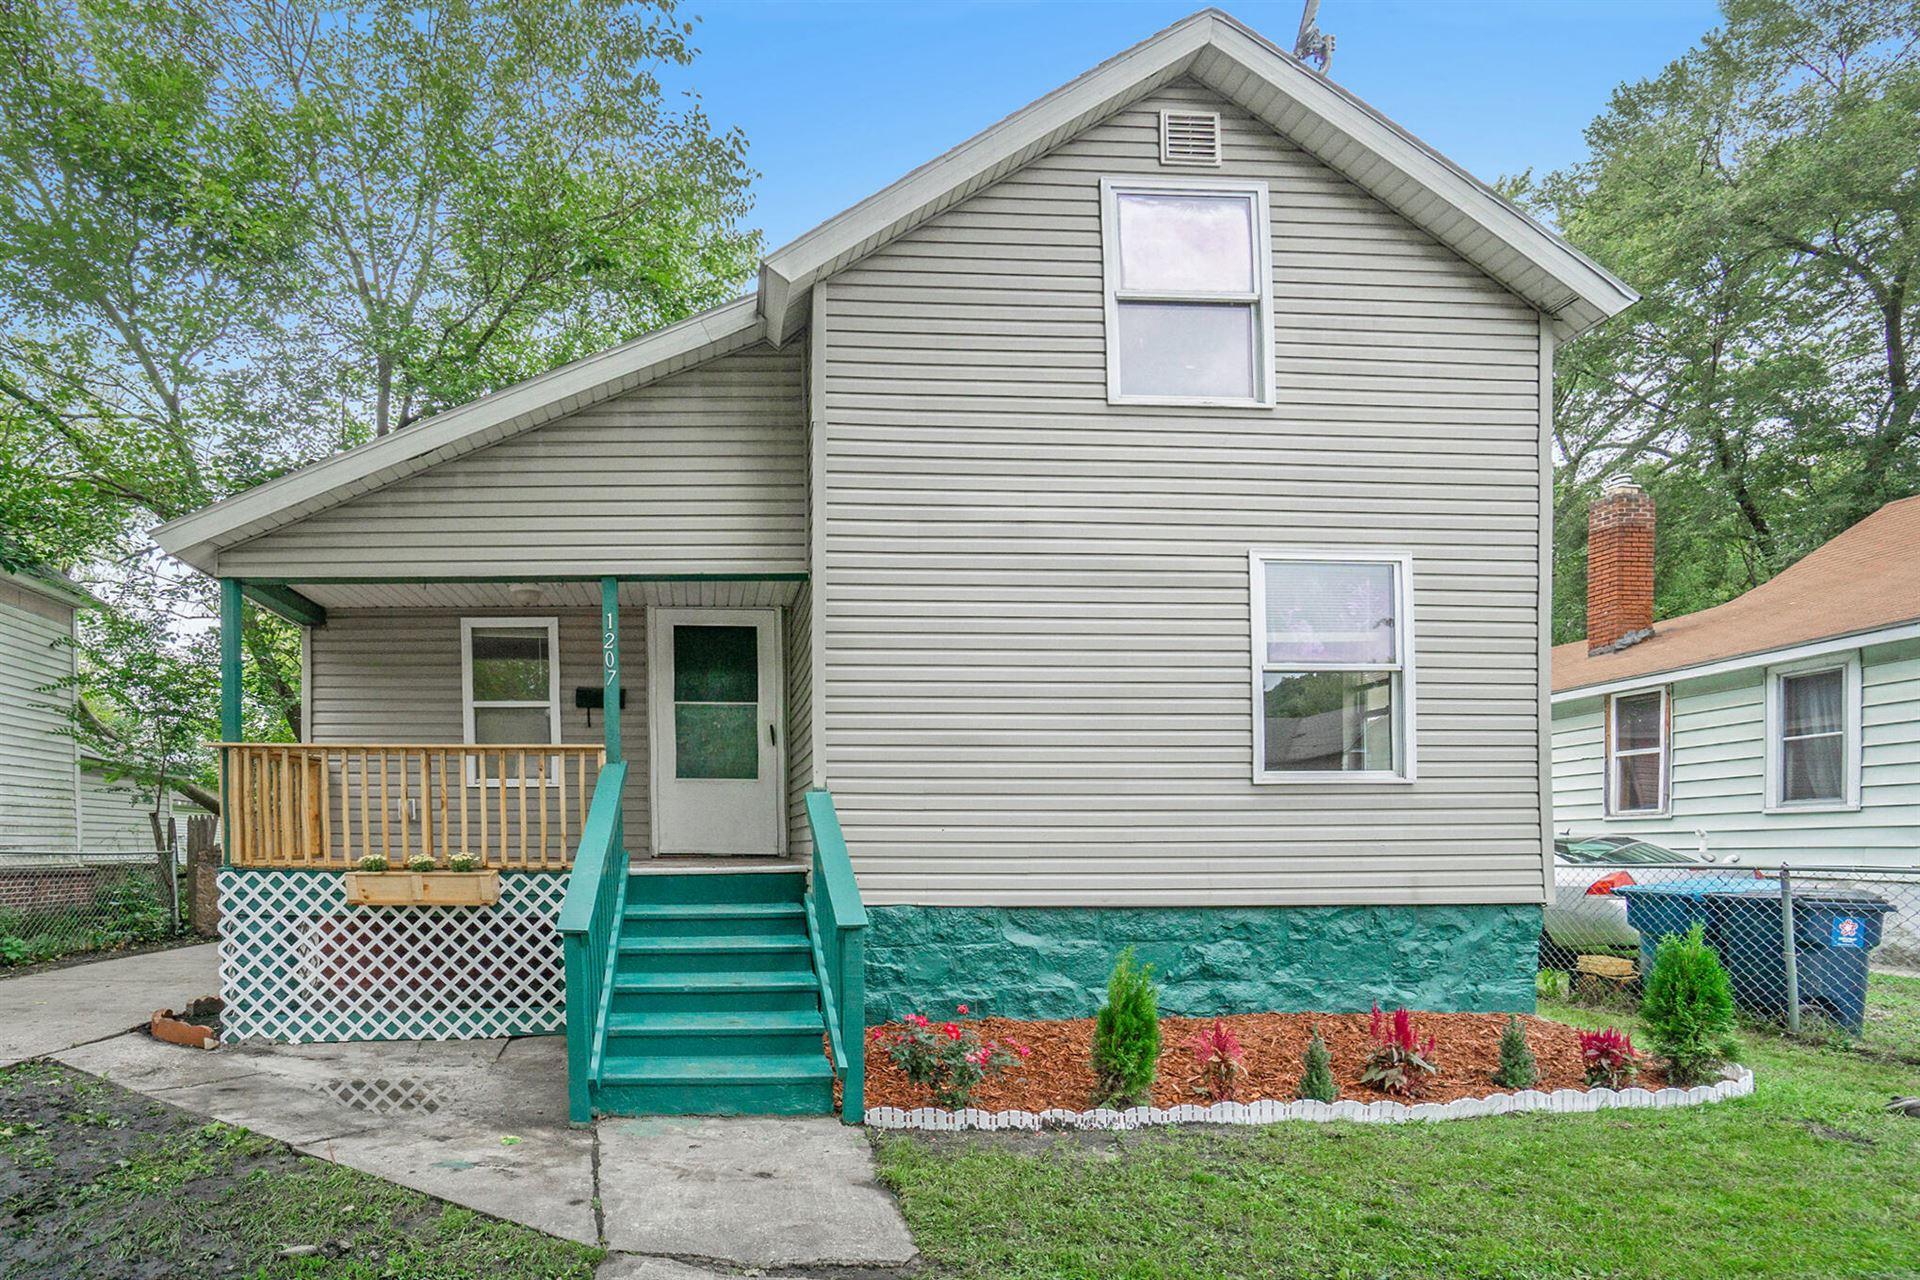 1207 N Park Street, Kalamazoo, MI 49007 - MLS#: 21111490